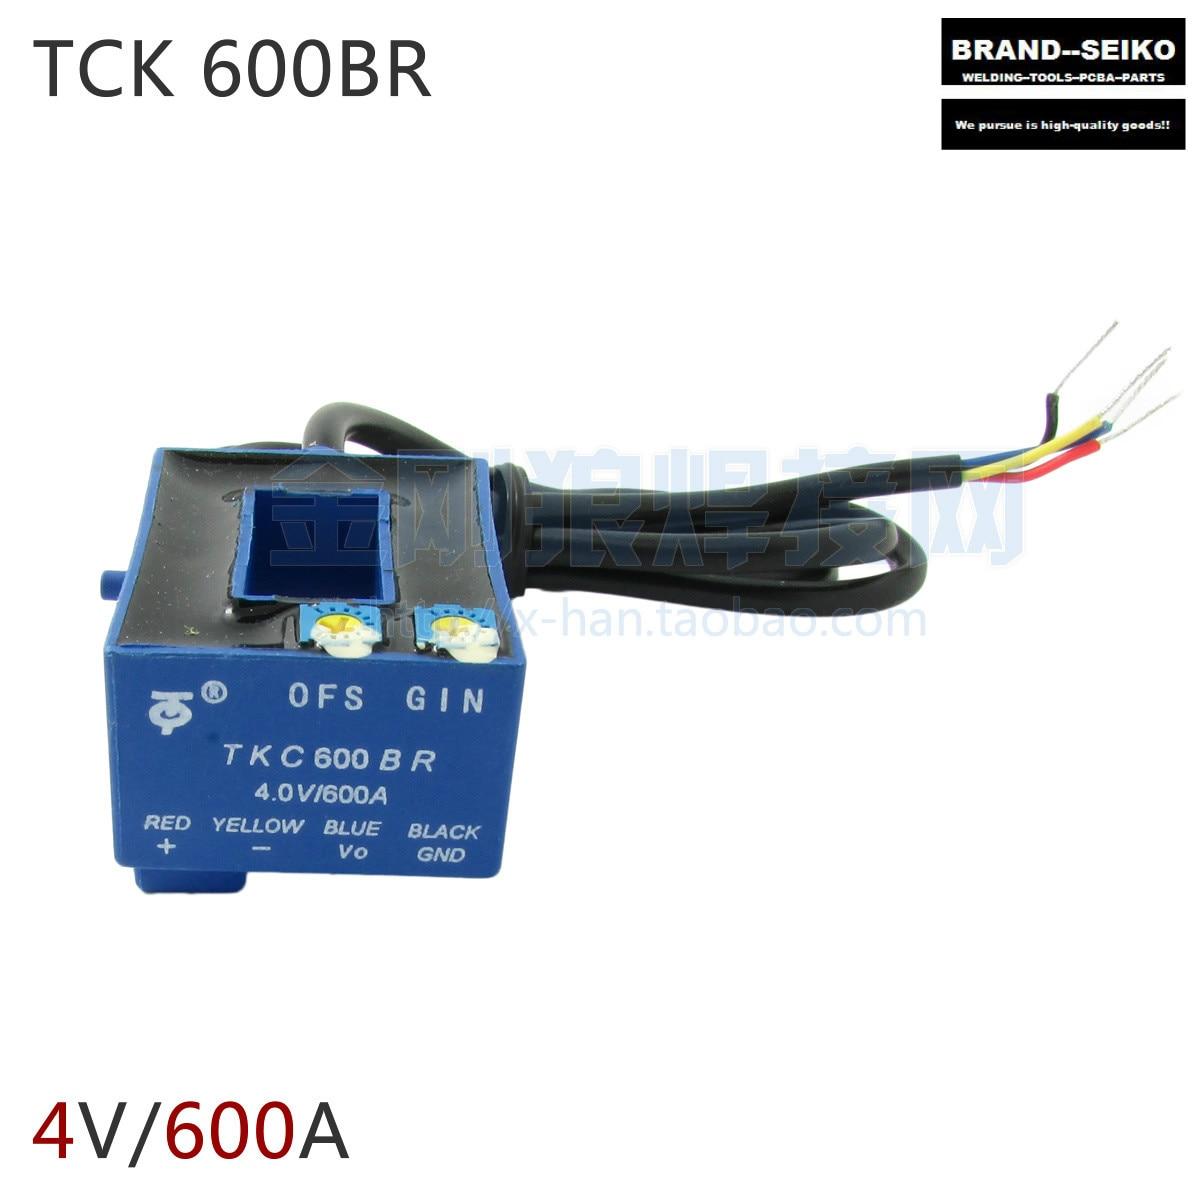 ФОТО 600br 4v 600a Tck Sensor Feedback Band Line